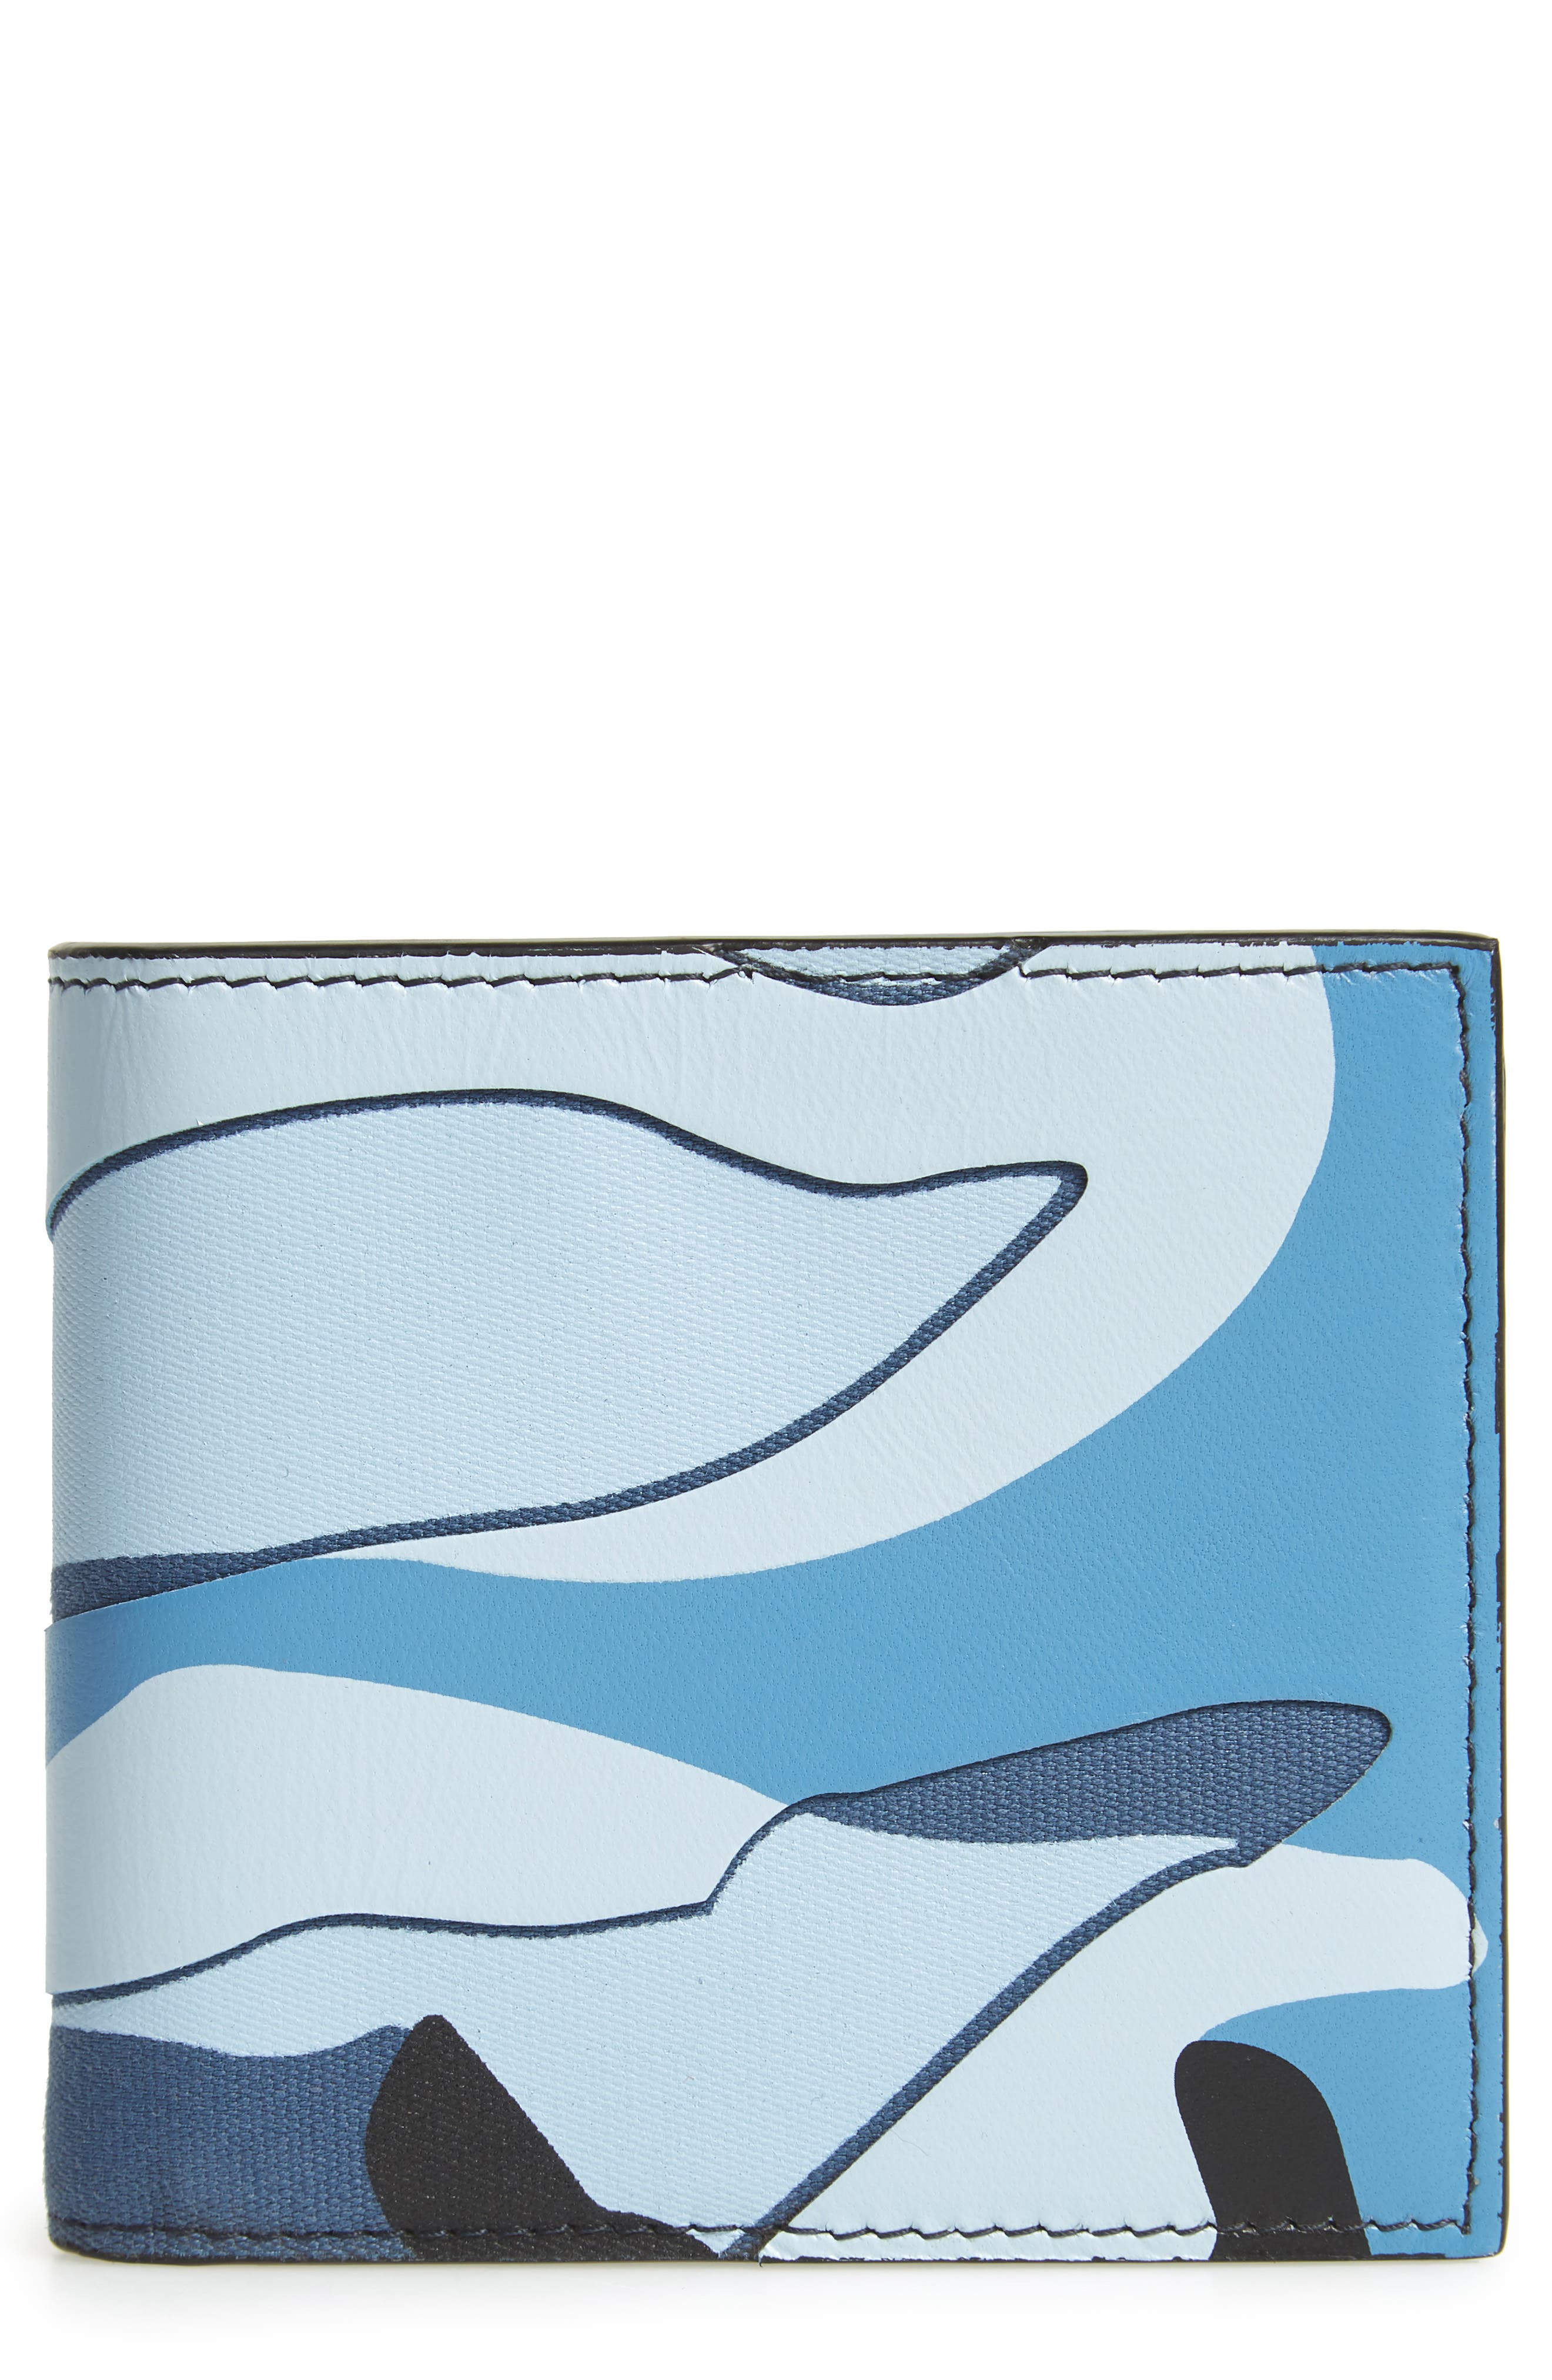 VALENTINO GARAVANI Camo Canvas & Leather Wallet